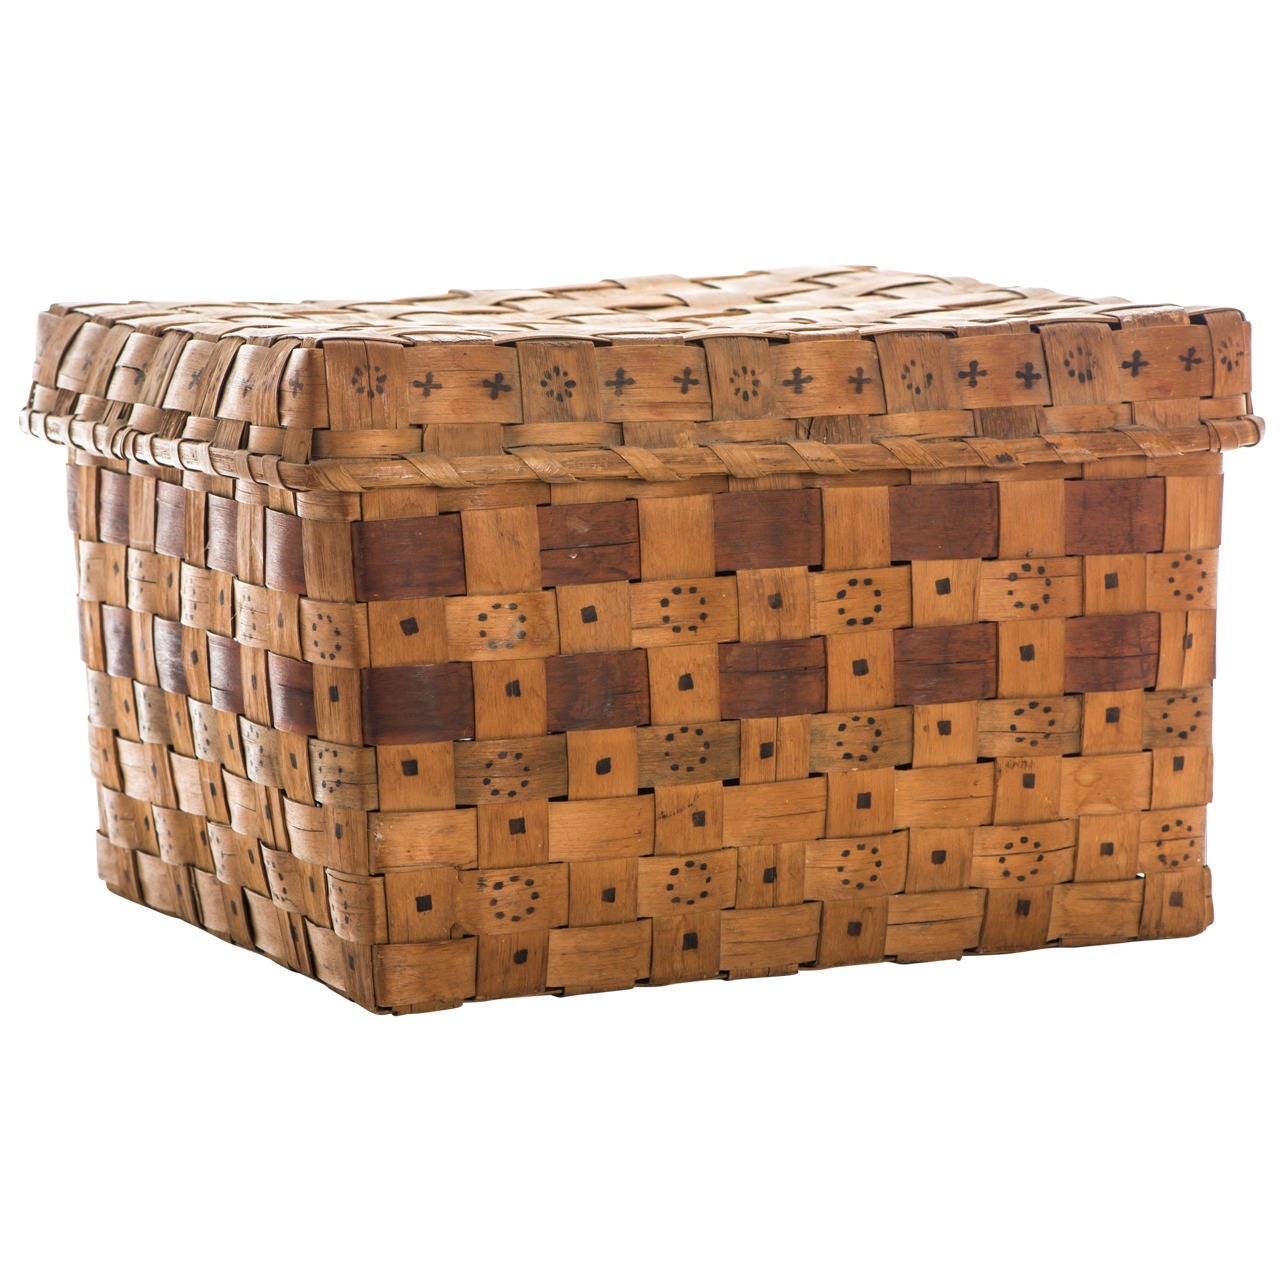 Mid-19th Century Native American Splint Basket